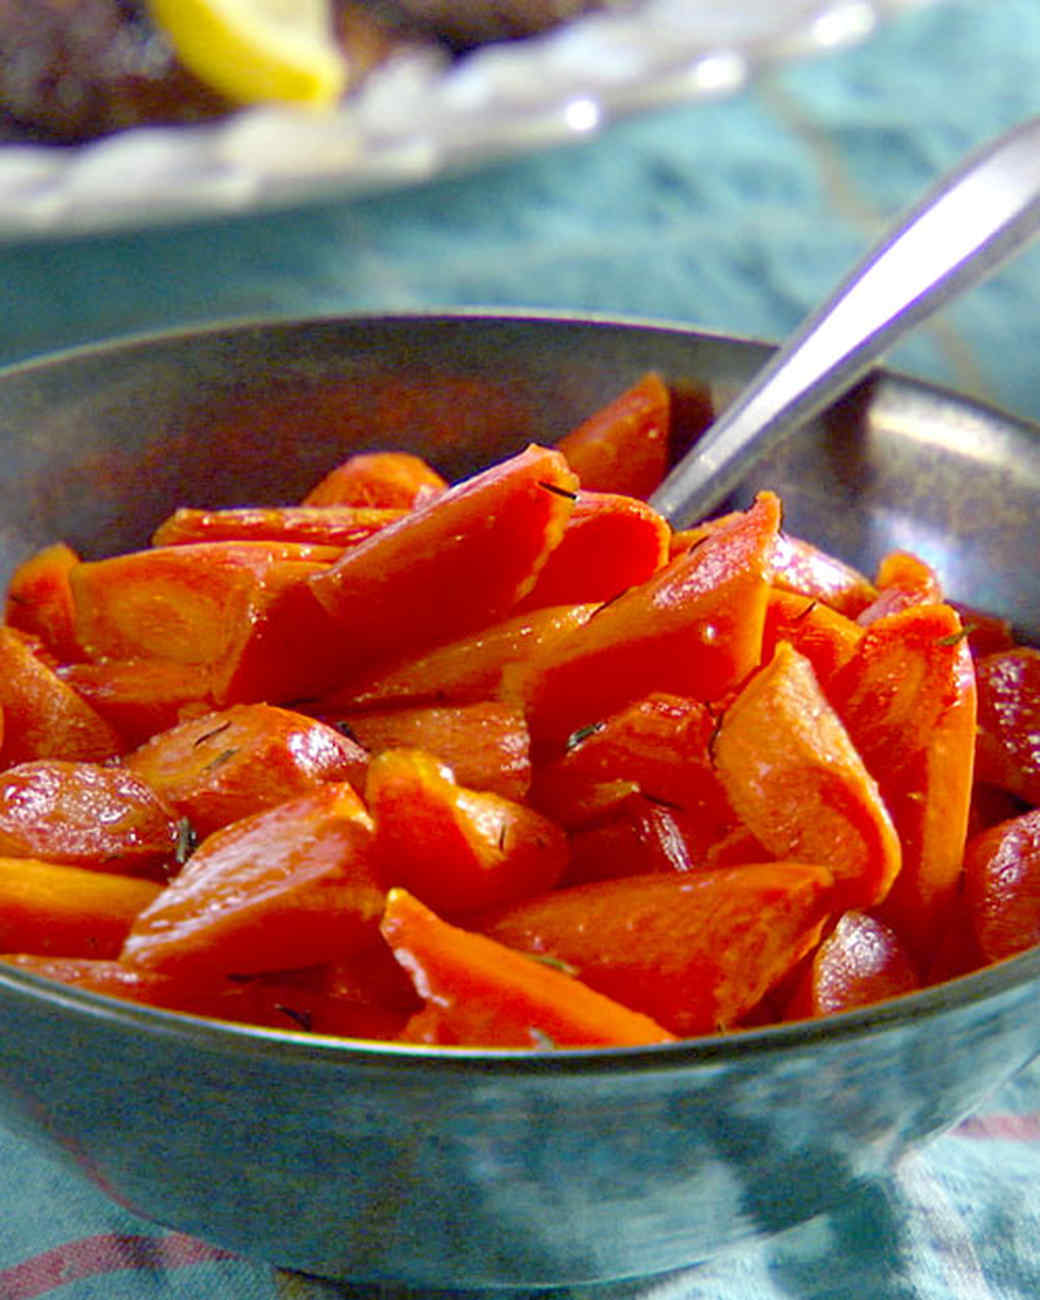 mh_1100_maple_roasted_carrots.jpg